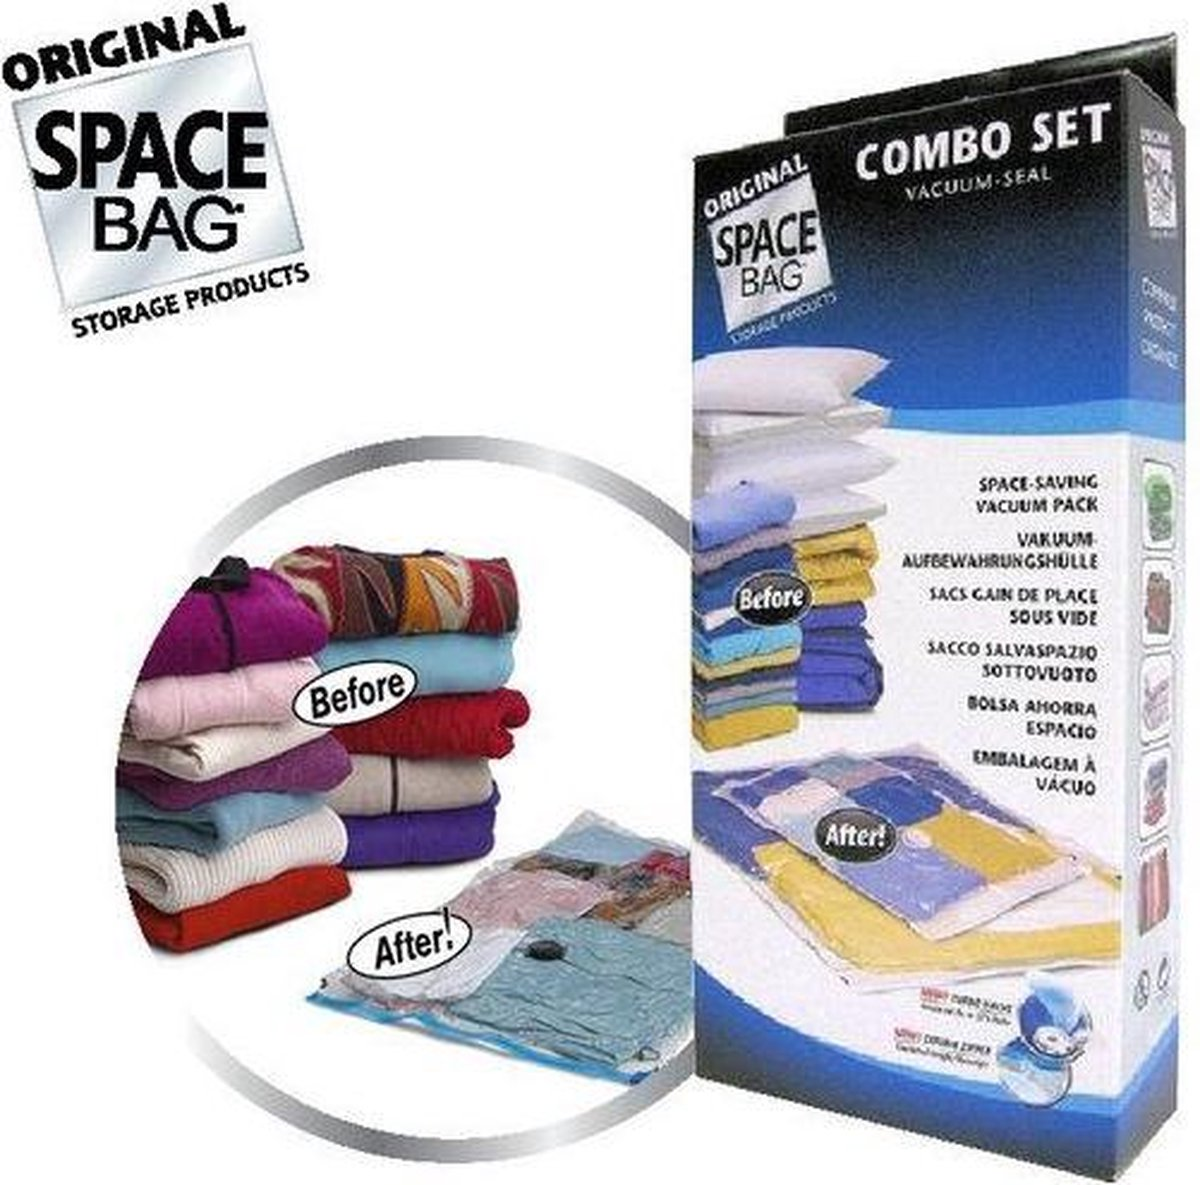 Space Bag Vacuüm opbergzakken 2-delige Combo Set - Space Bag